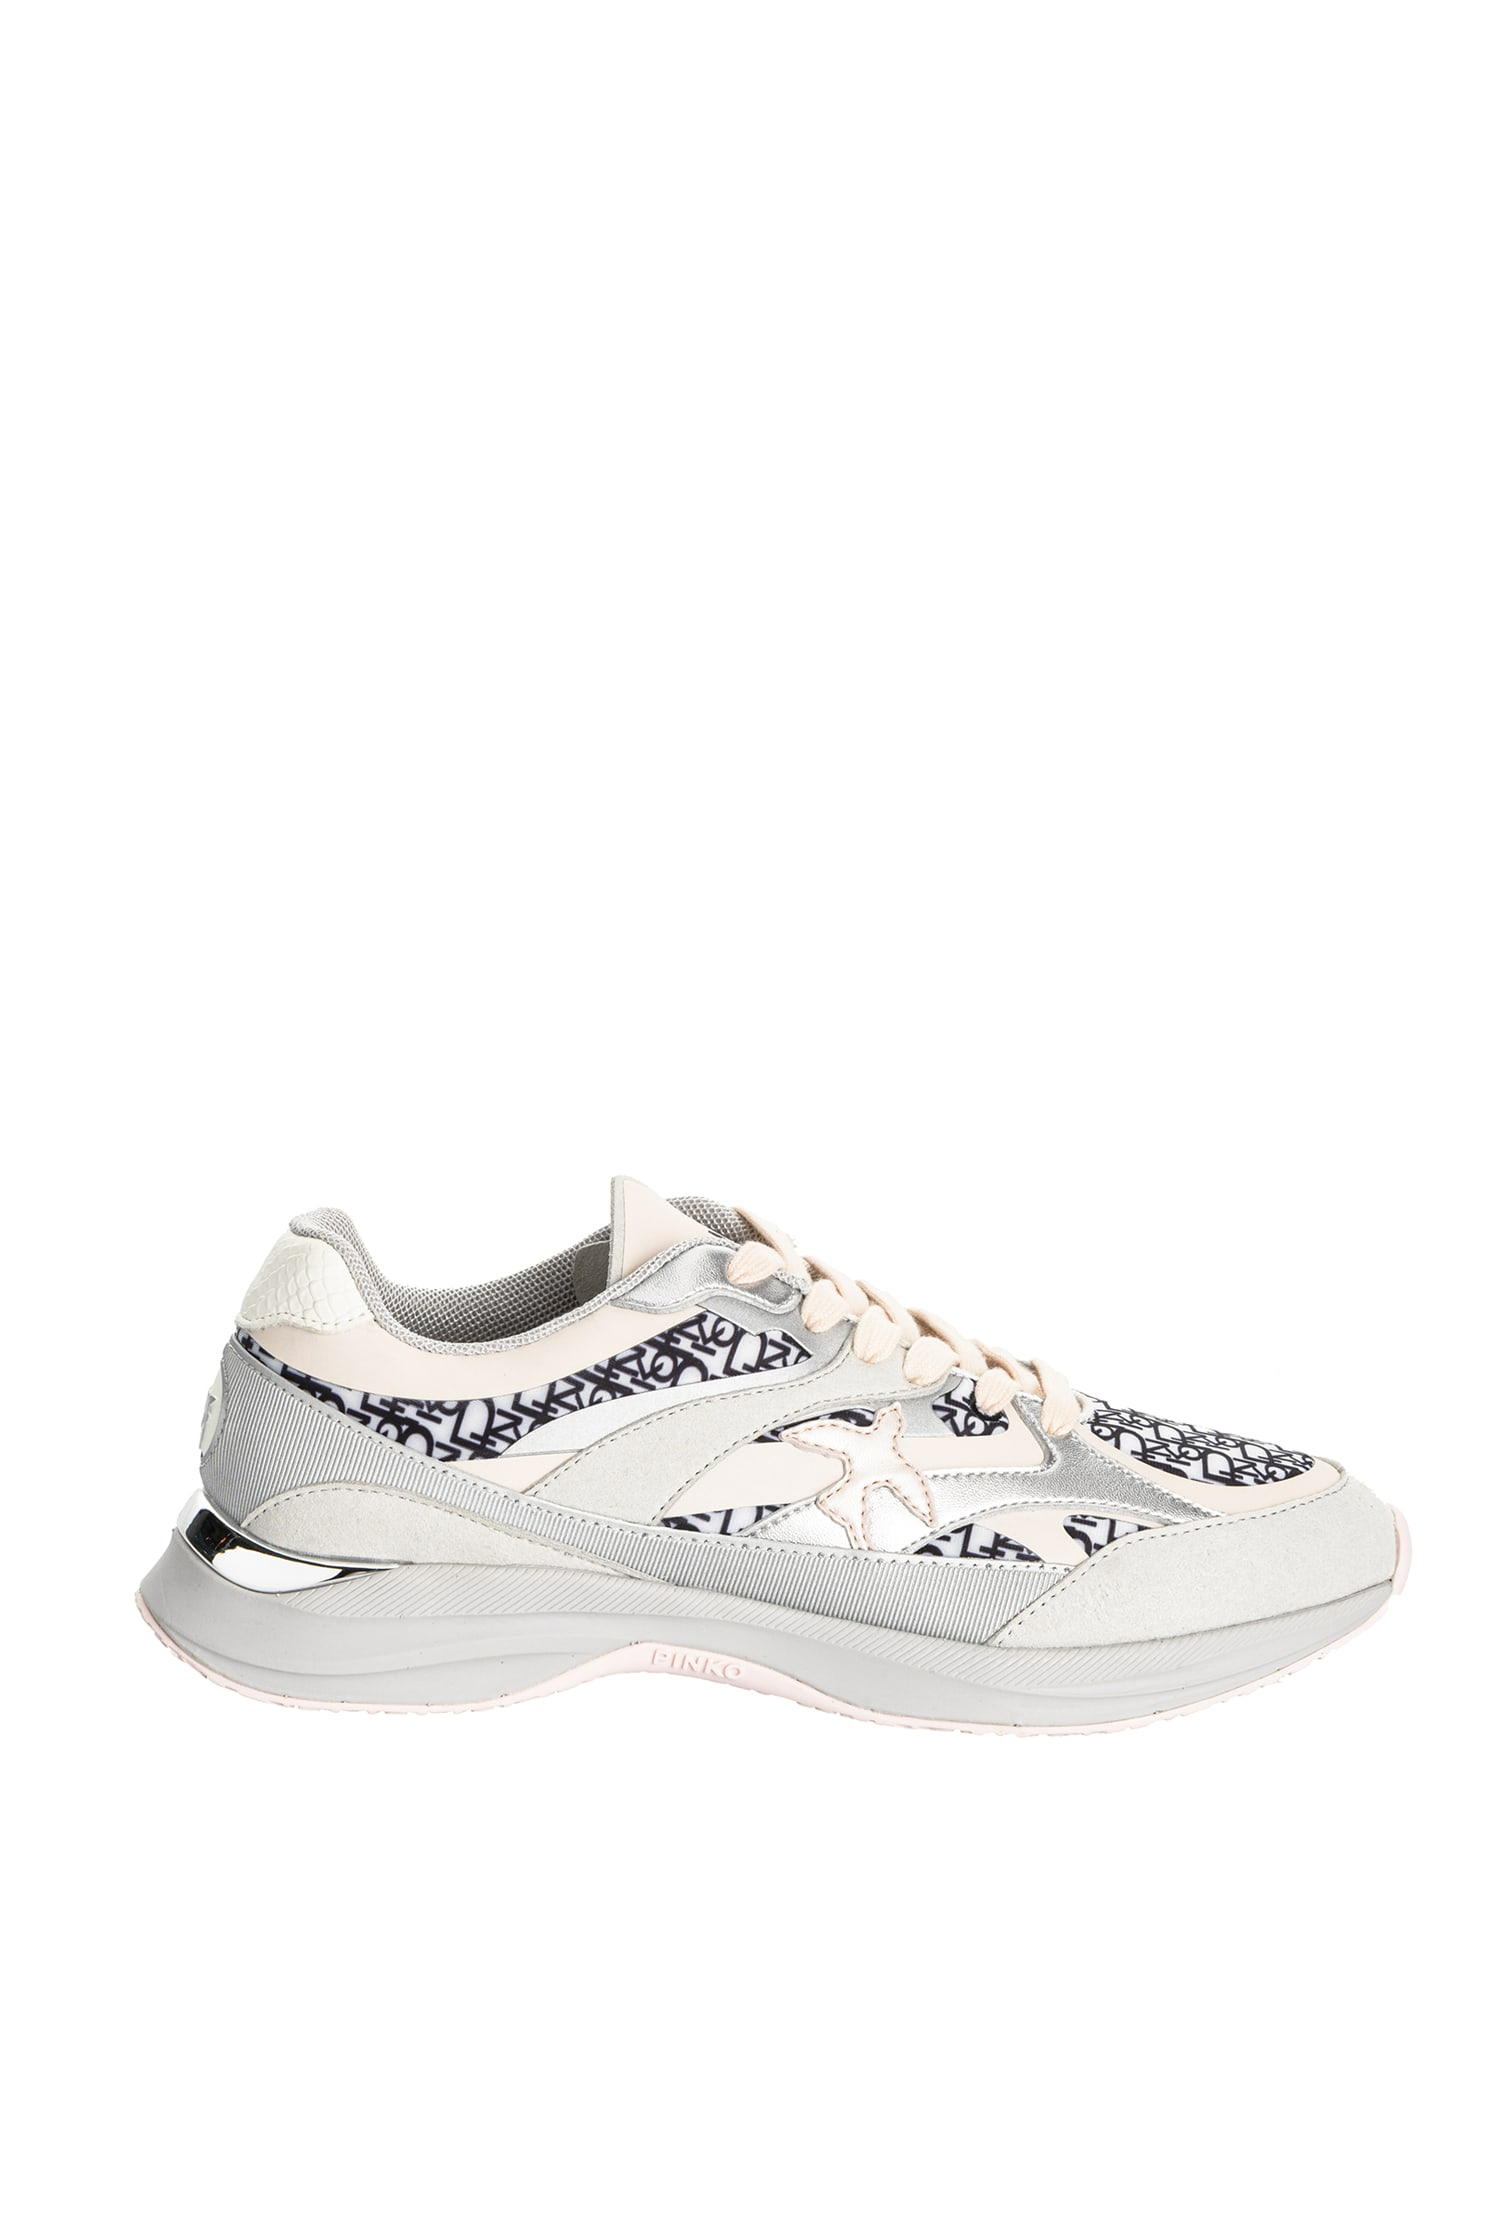 Sneakers Lightech microfibra bianco nero Pinko